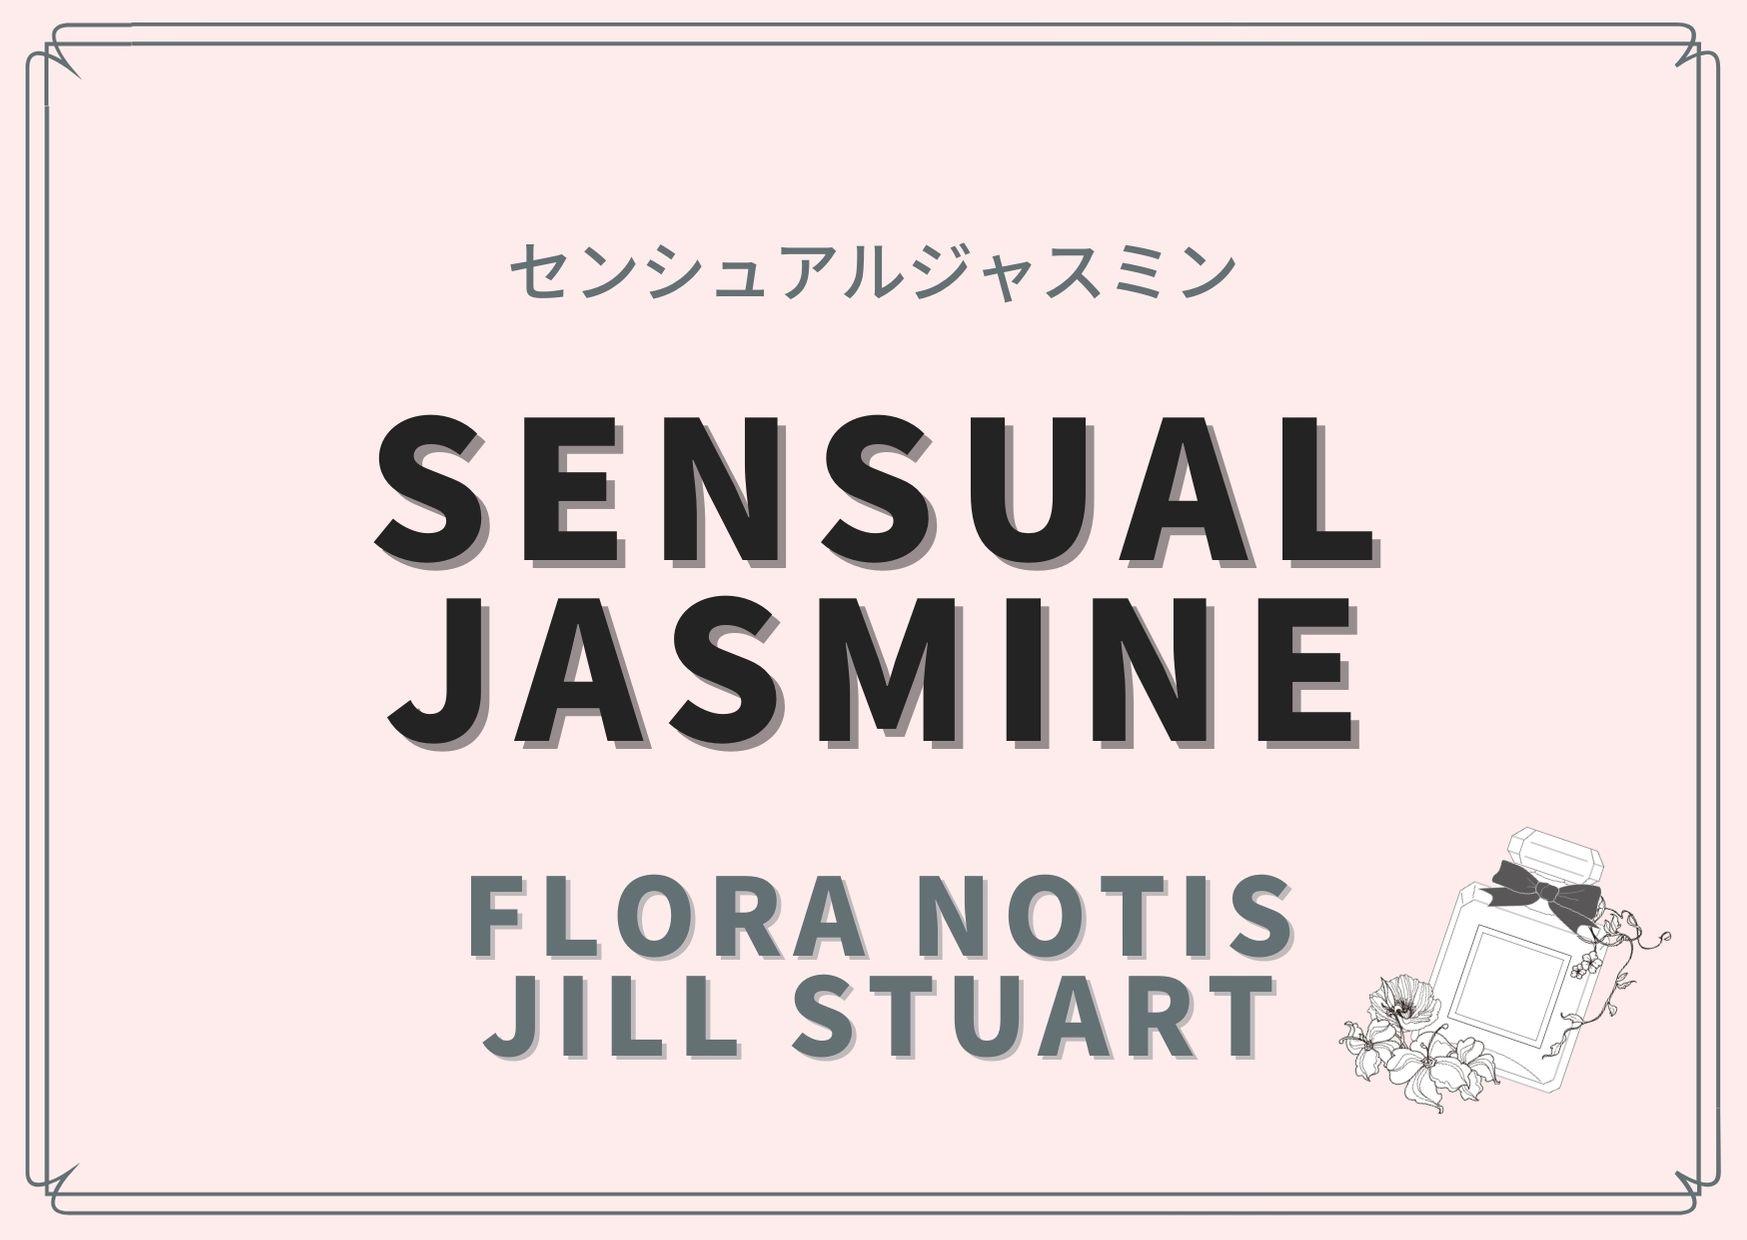 Sensual Jasmine(センシュアルジャスミン)/Flora Notis JILL STUART